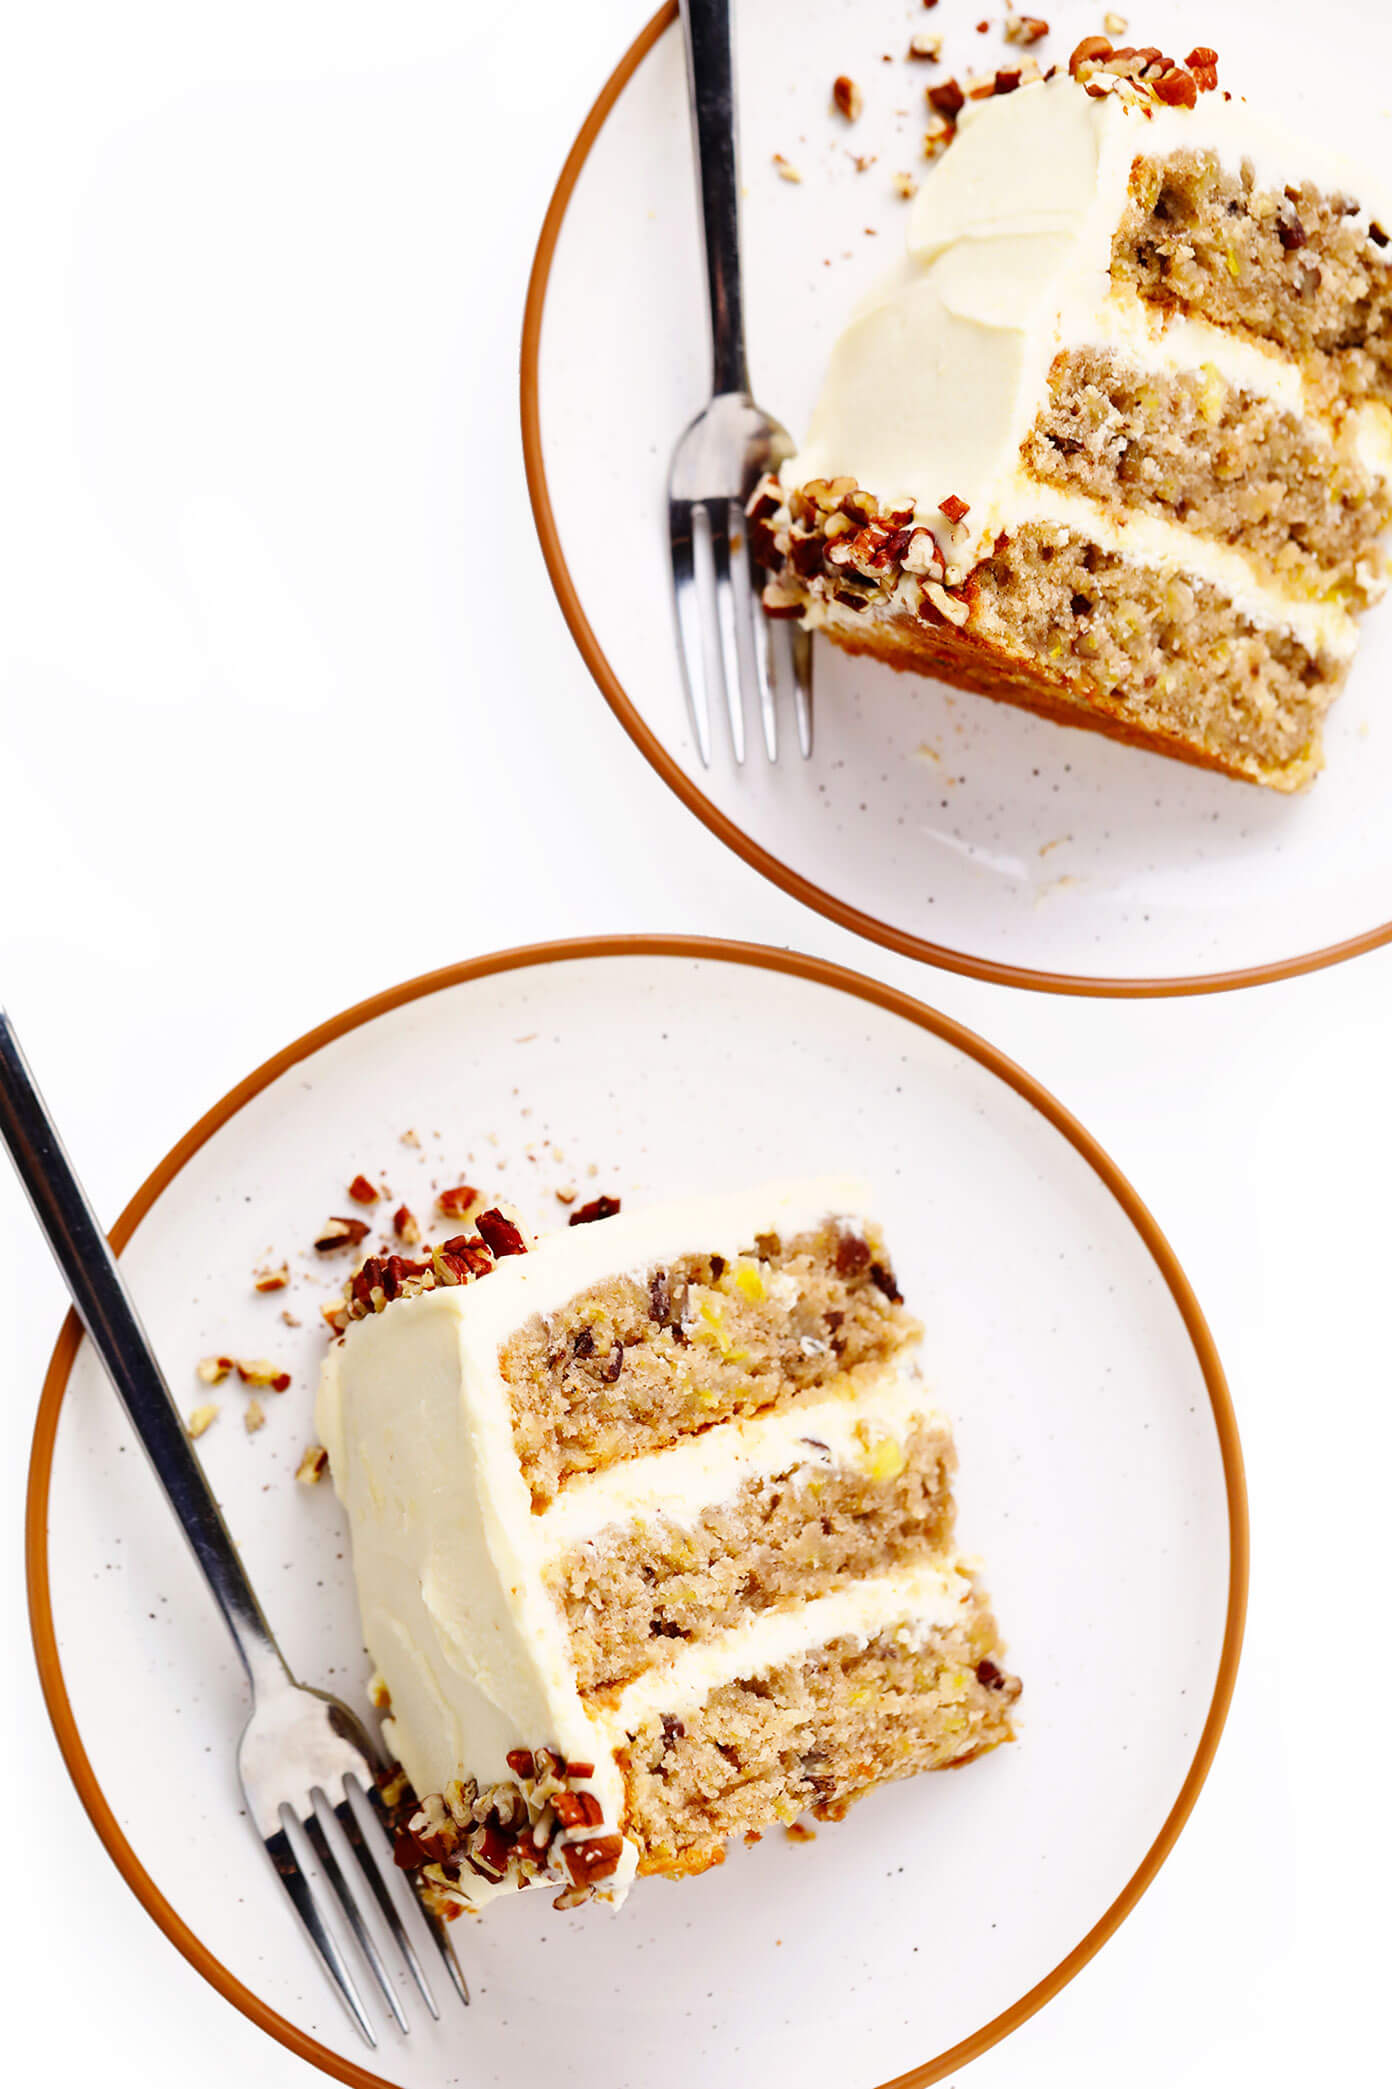 Slices of hummingbird cake